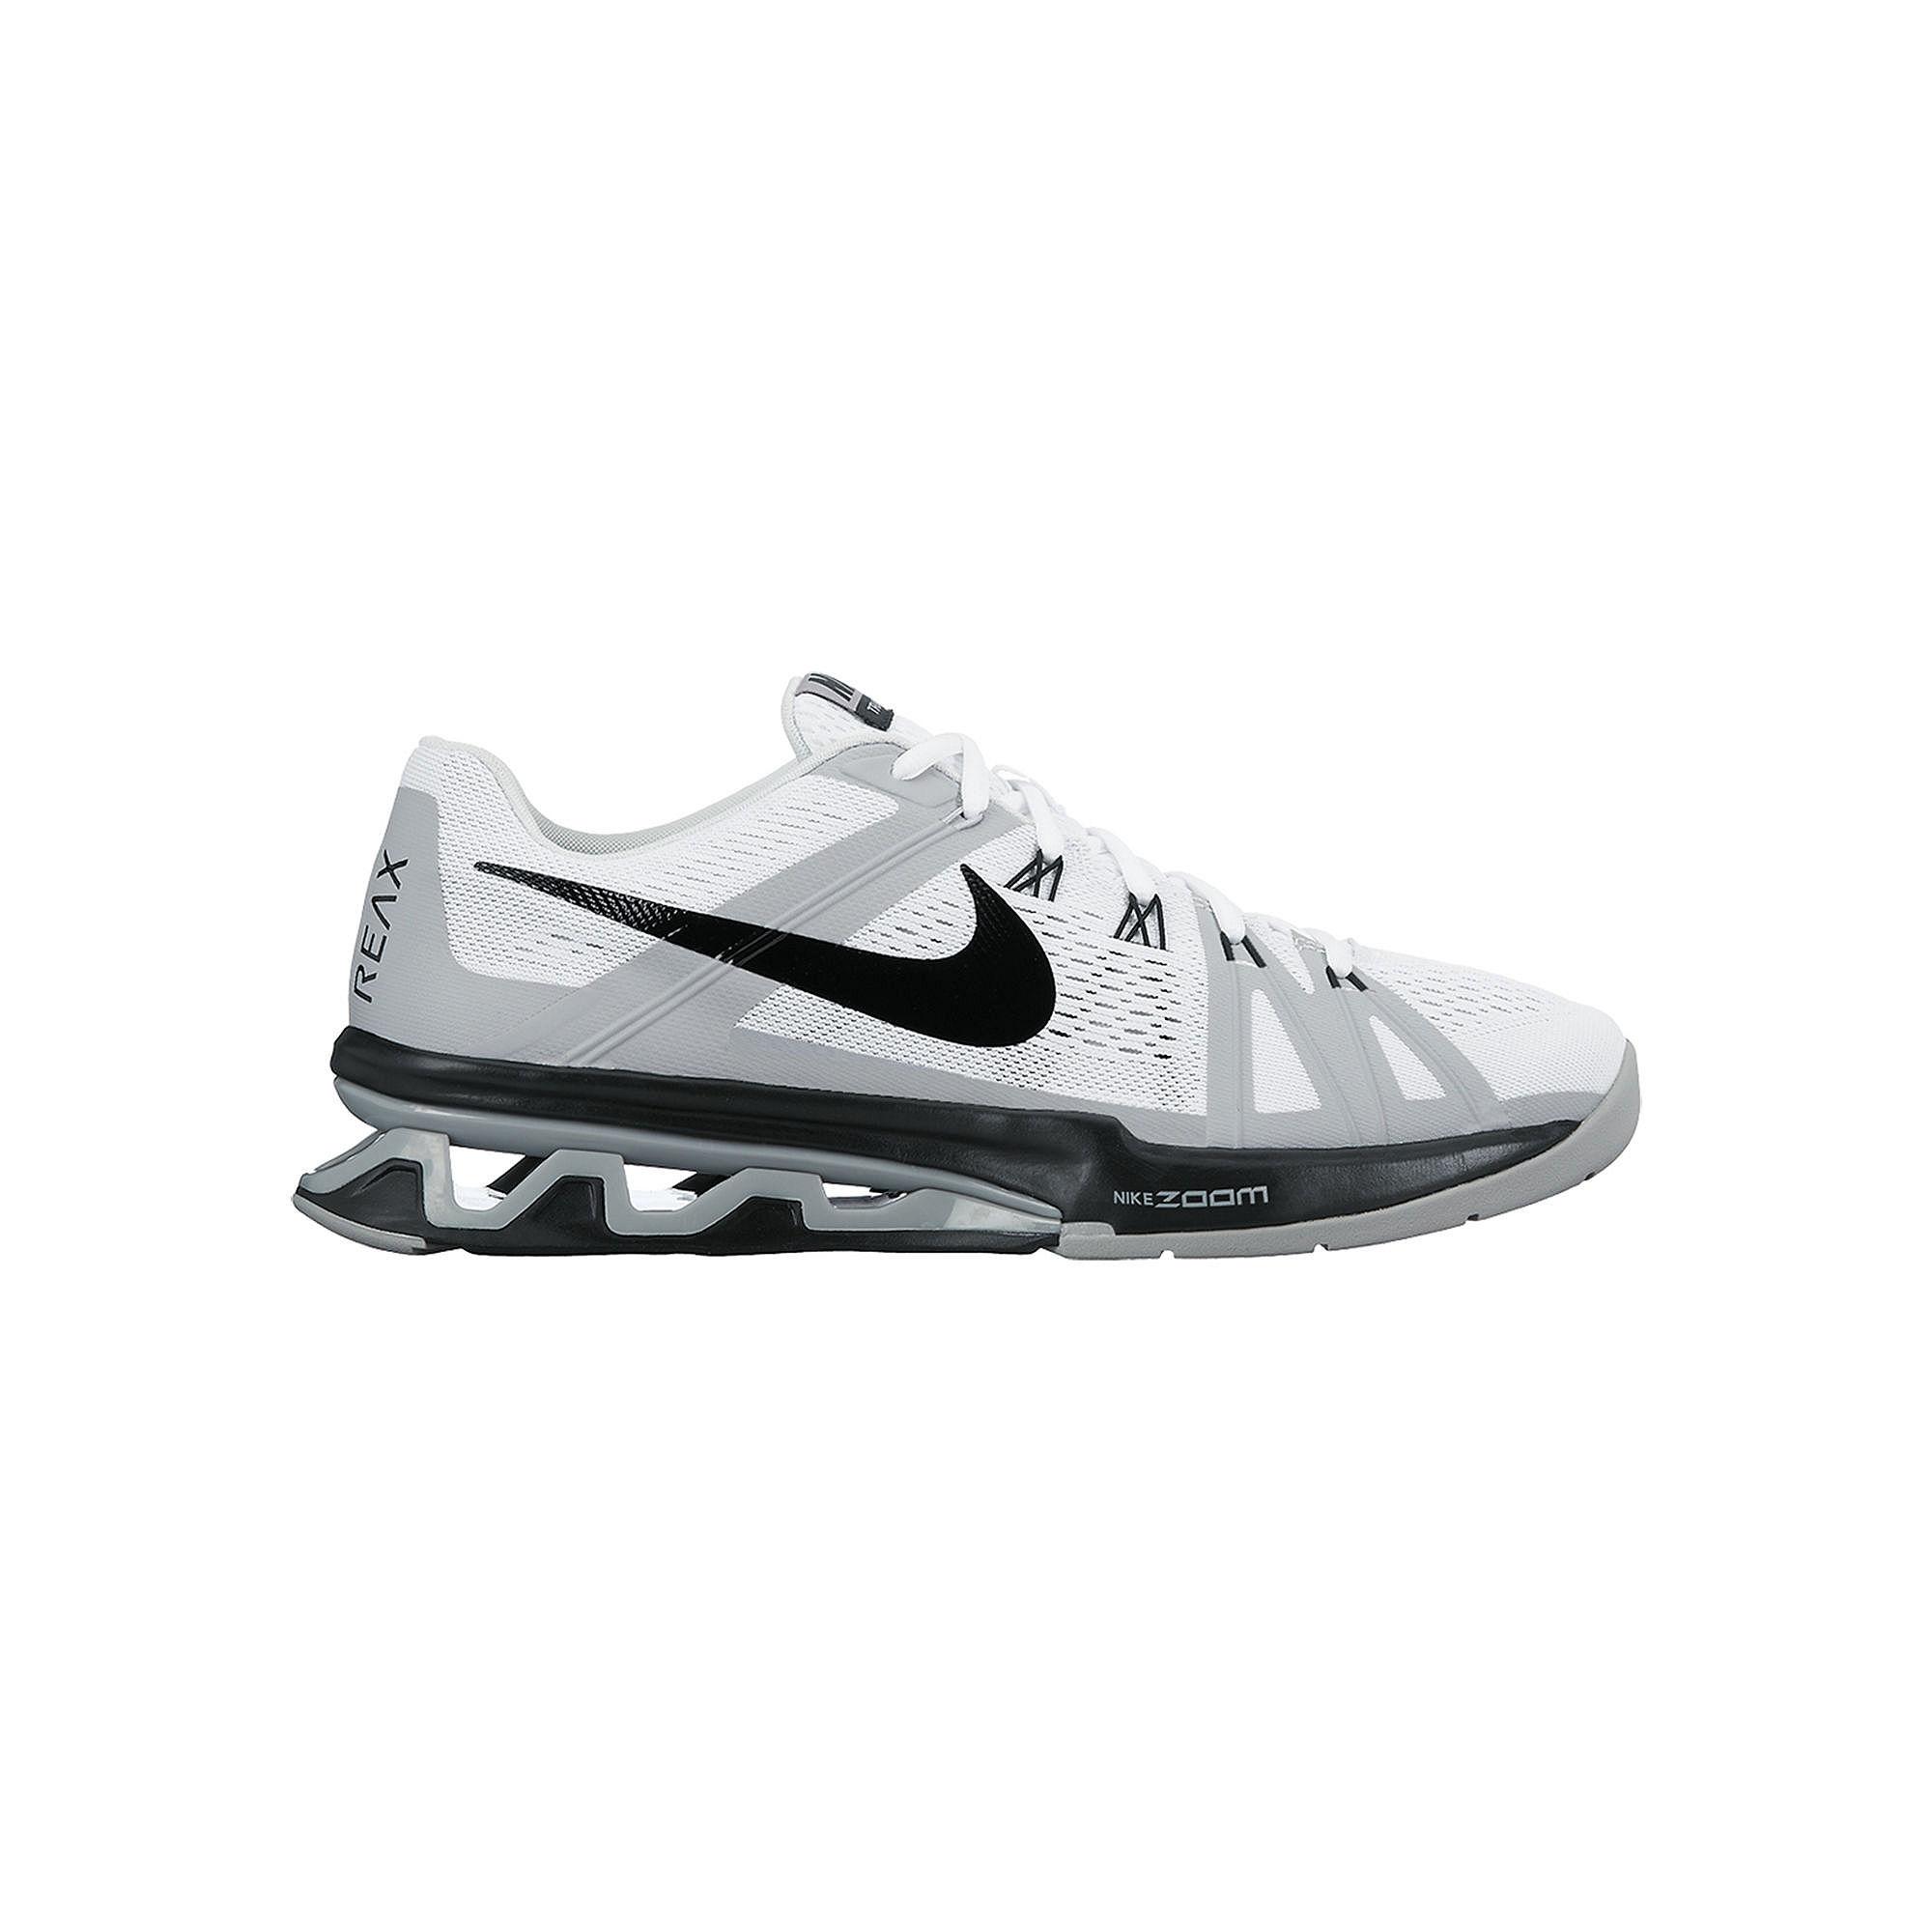 5b7266ae0ebd ... UPC 888410125632 product image for Nike Reax Lightspeed Mens Training  Shoes